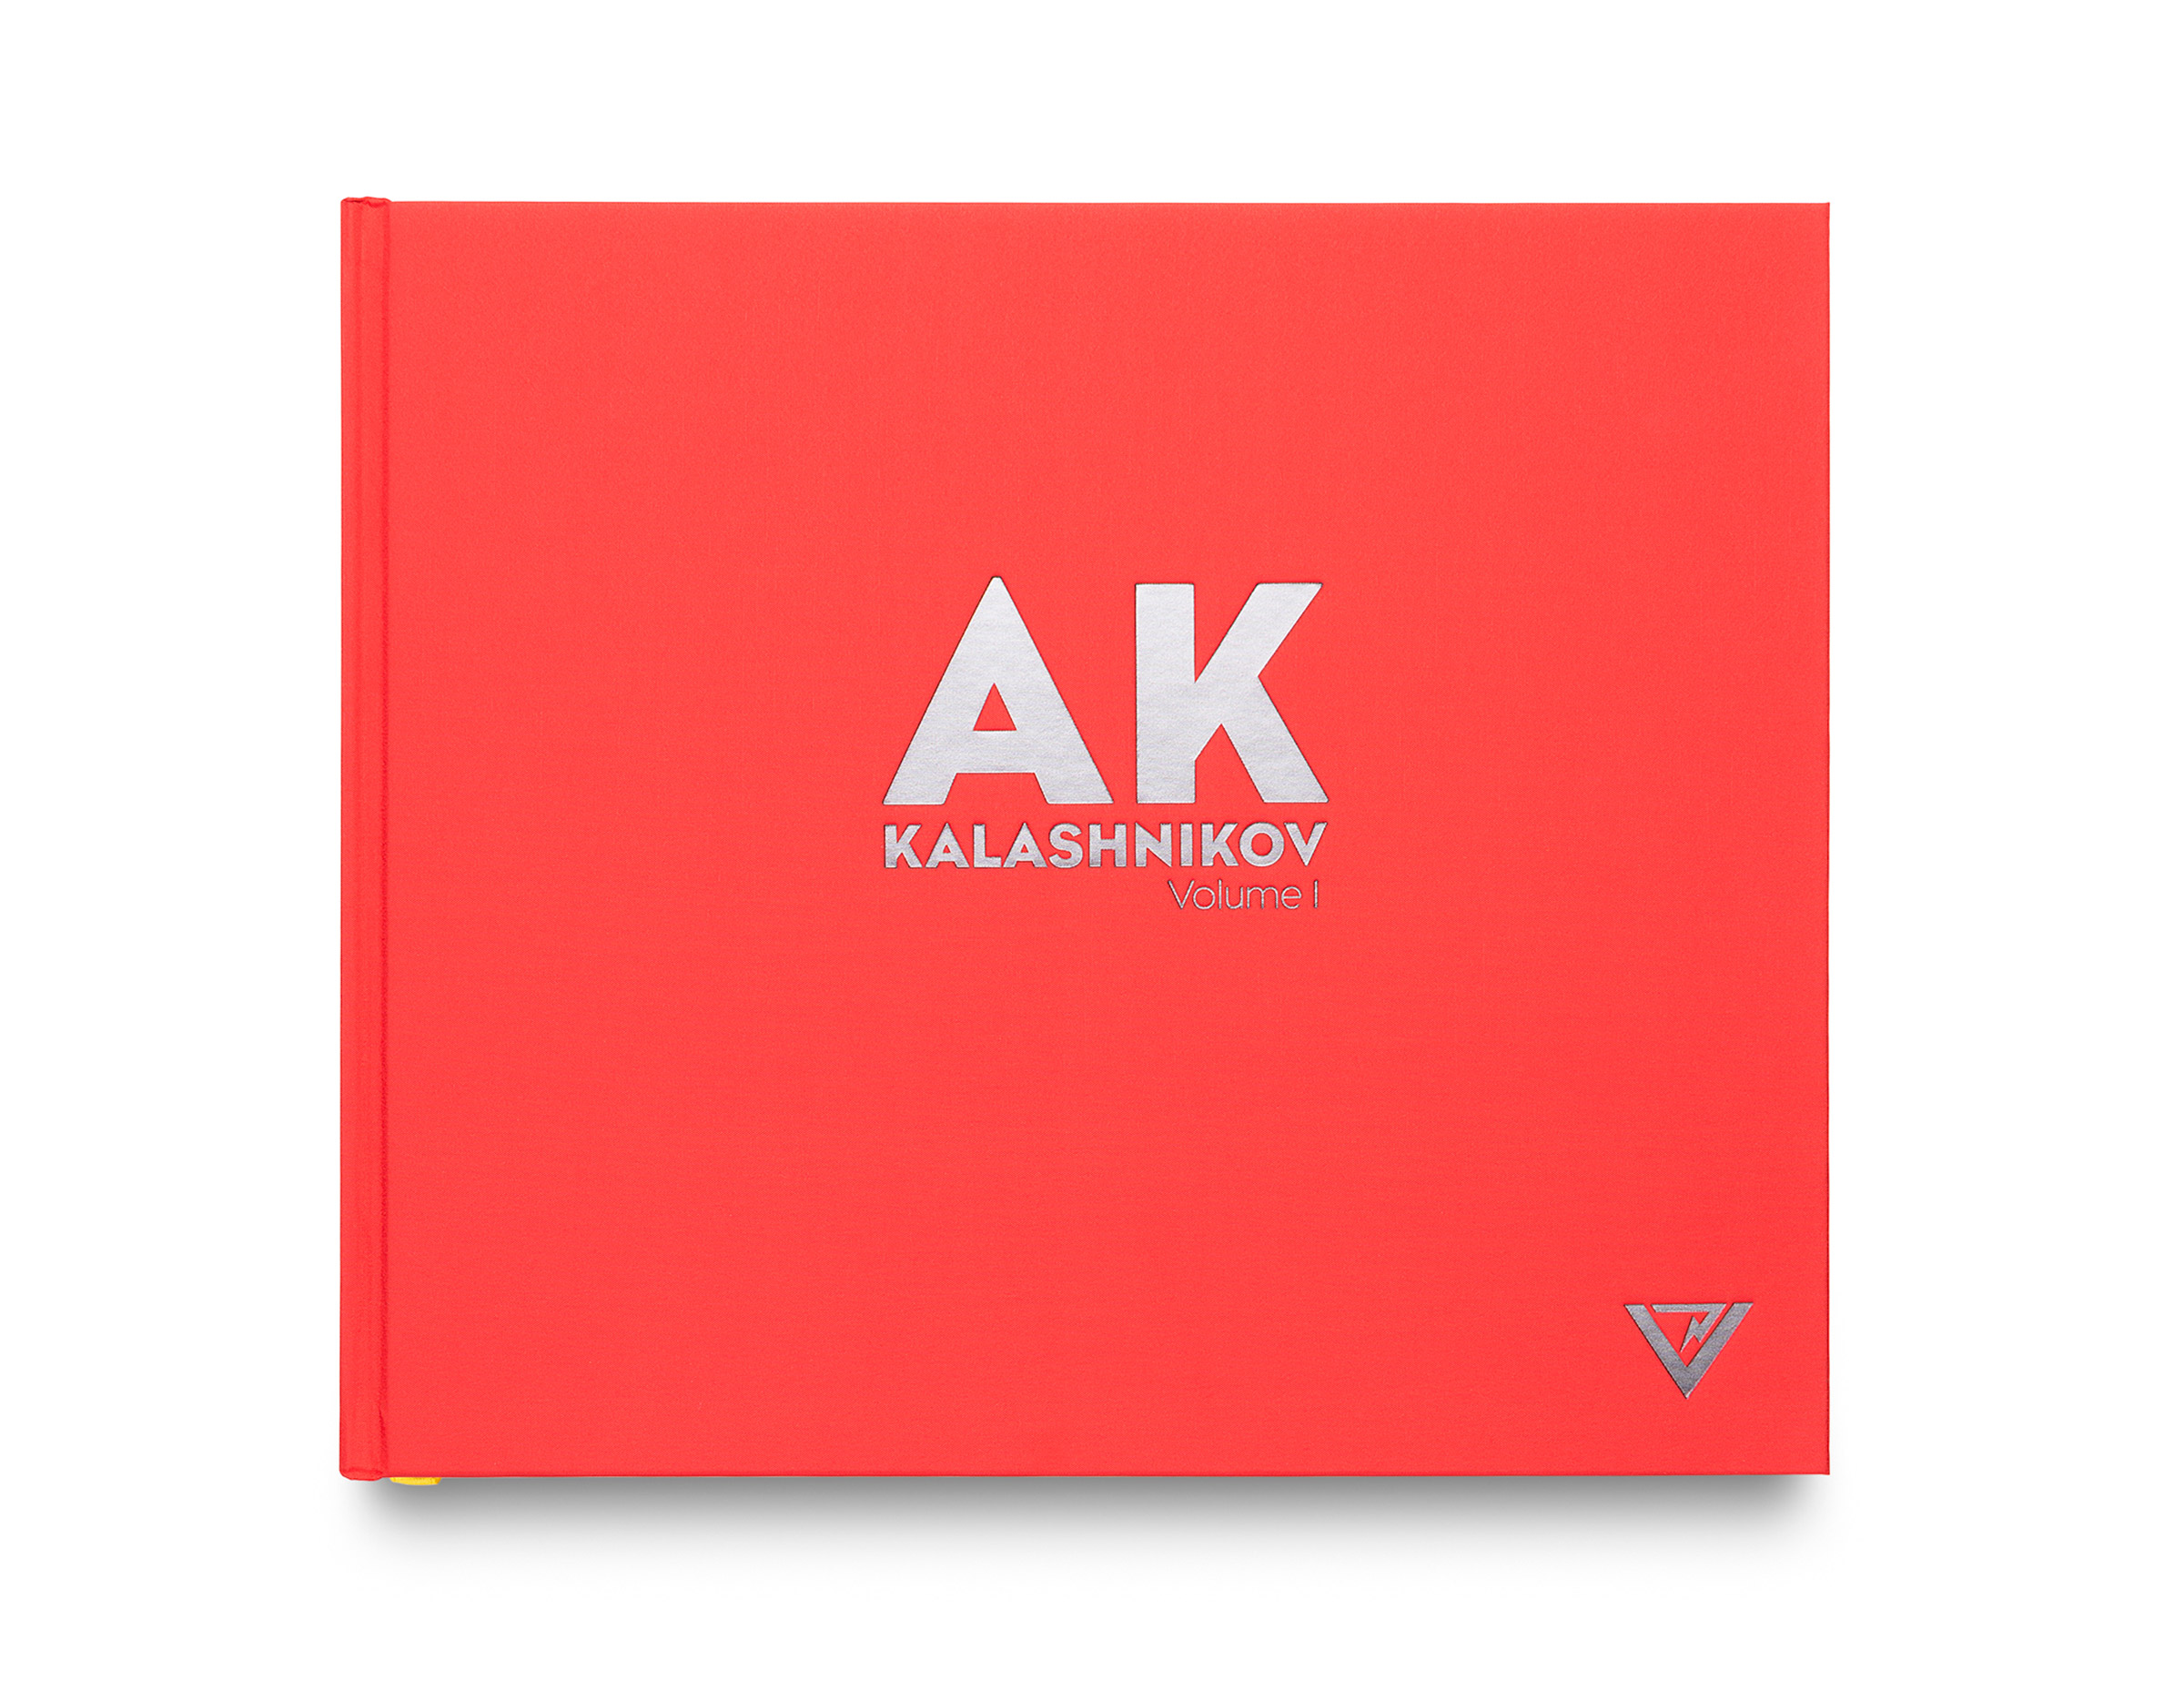 Hardcover_Front-AK_Vol-1.jpg